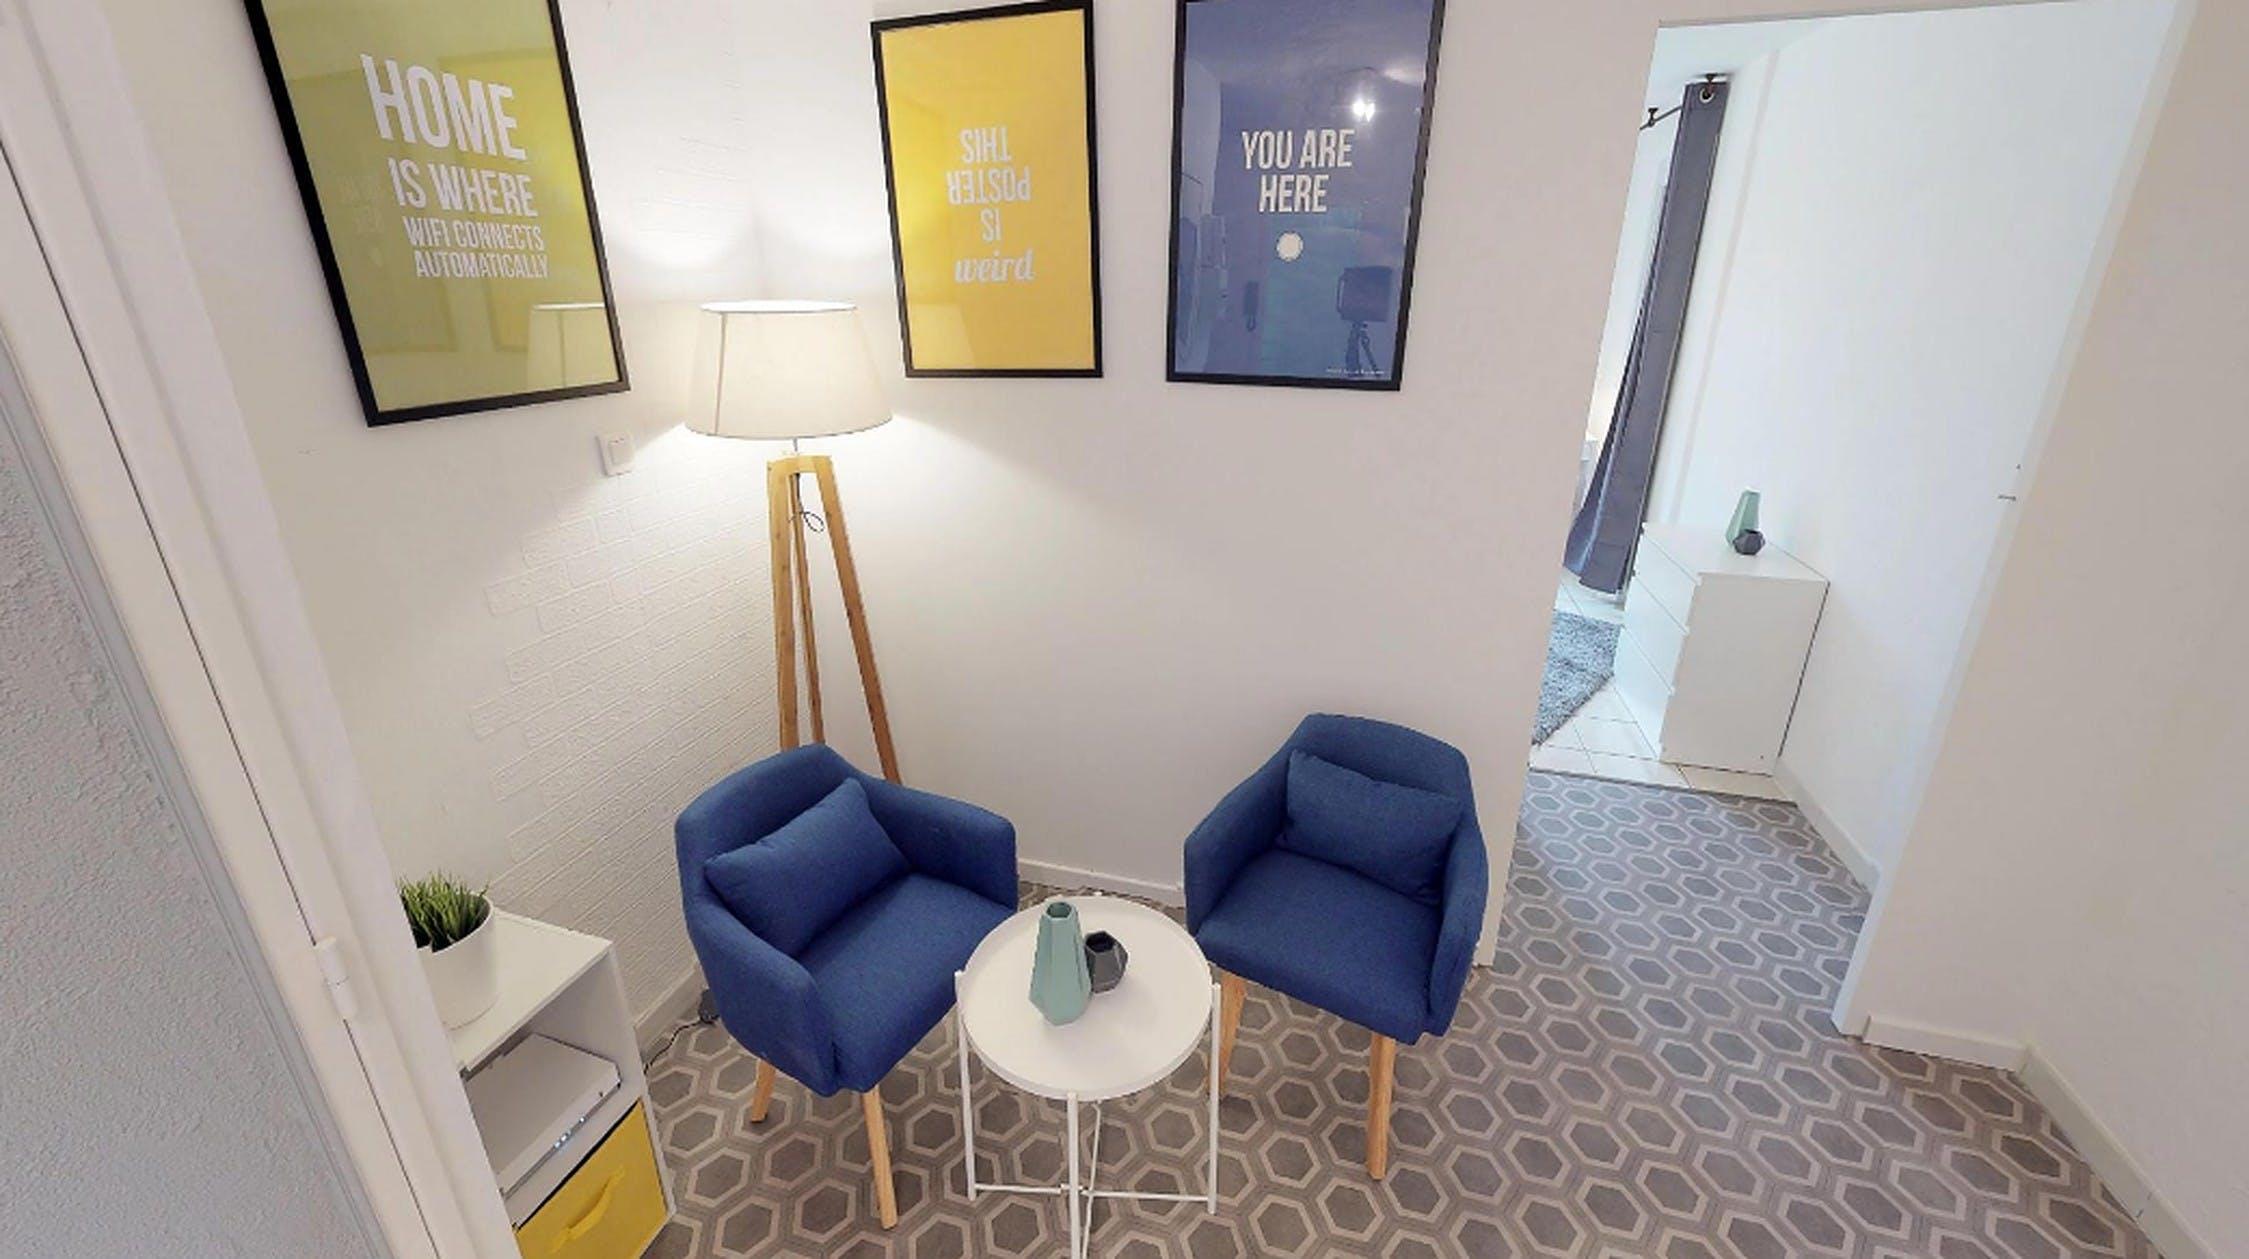 4 Residents | Bourrassol - Patte d'Oie | Stunning Cozy Apt. w/ Terrace